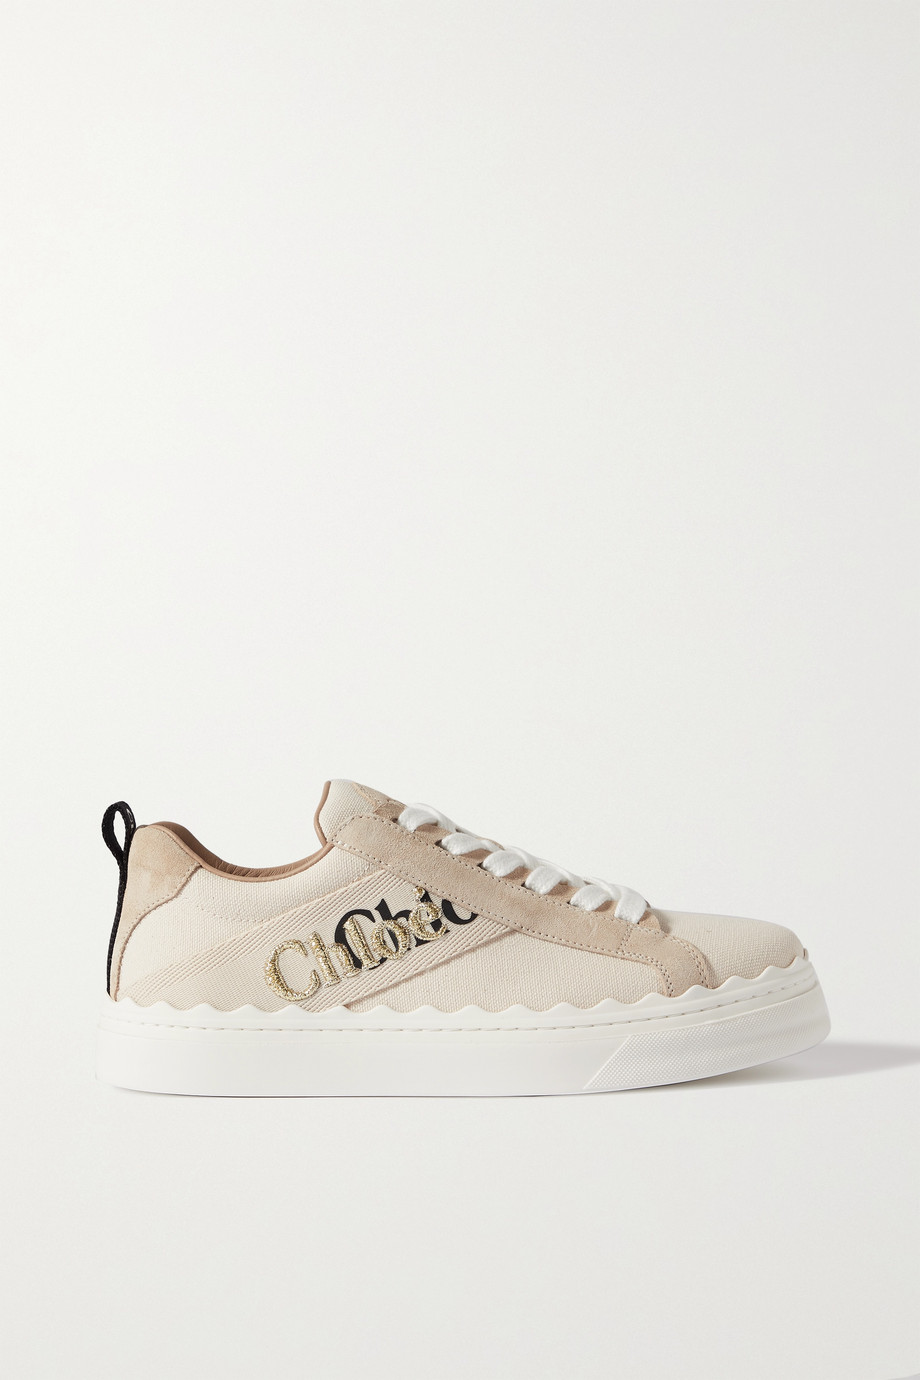 Chloé Lauren logo-detailed suede-trimmed canvas sneakers